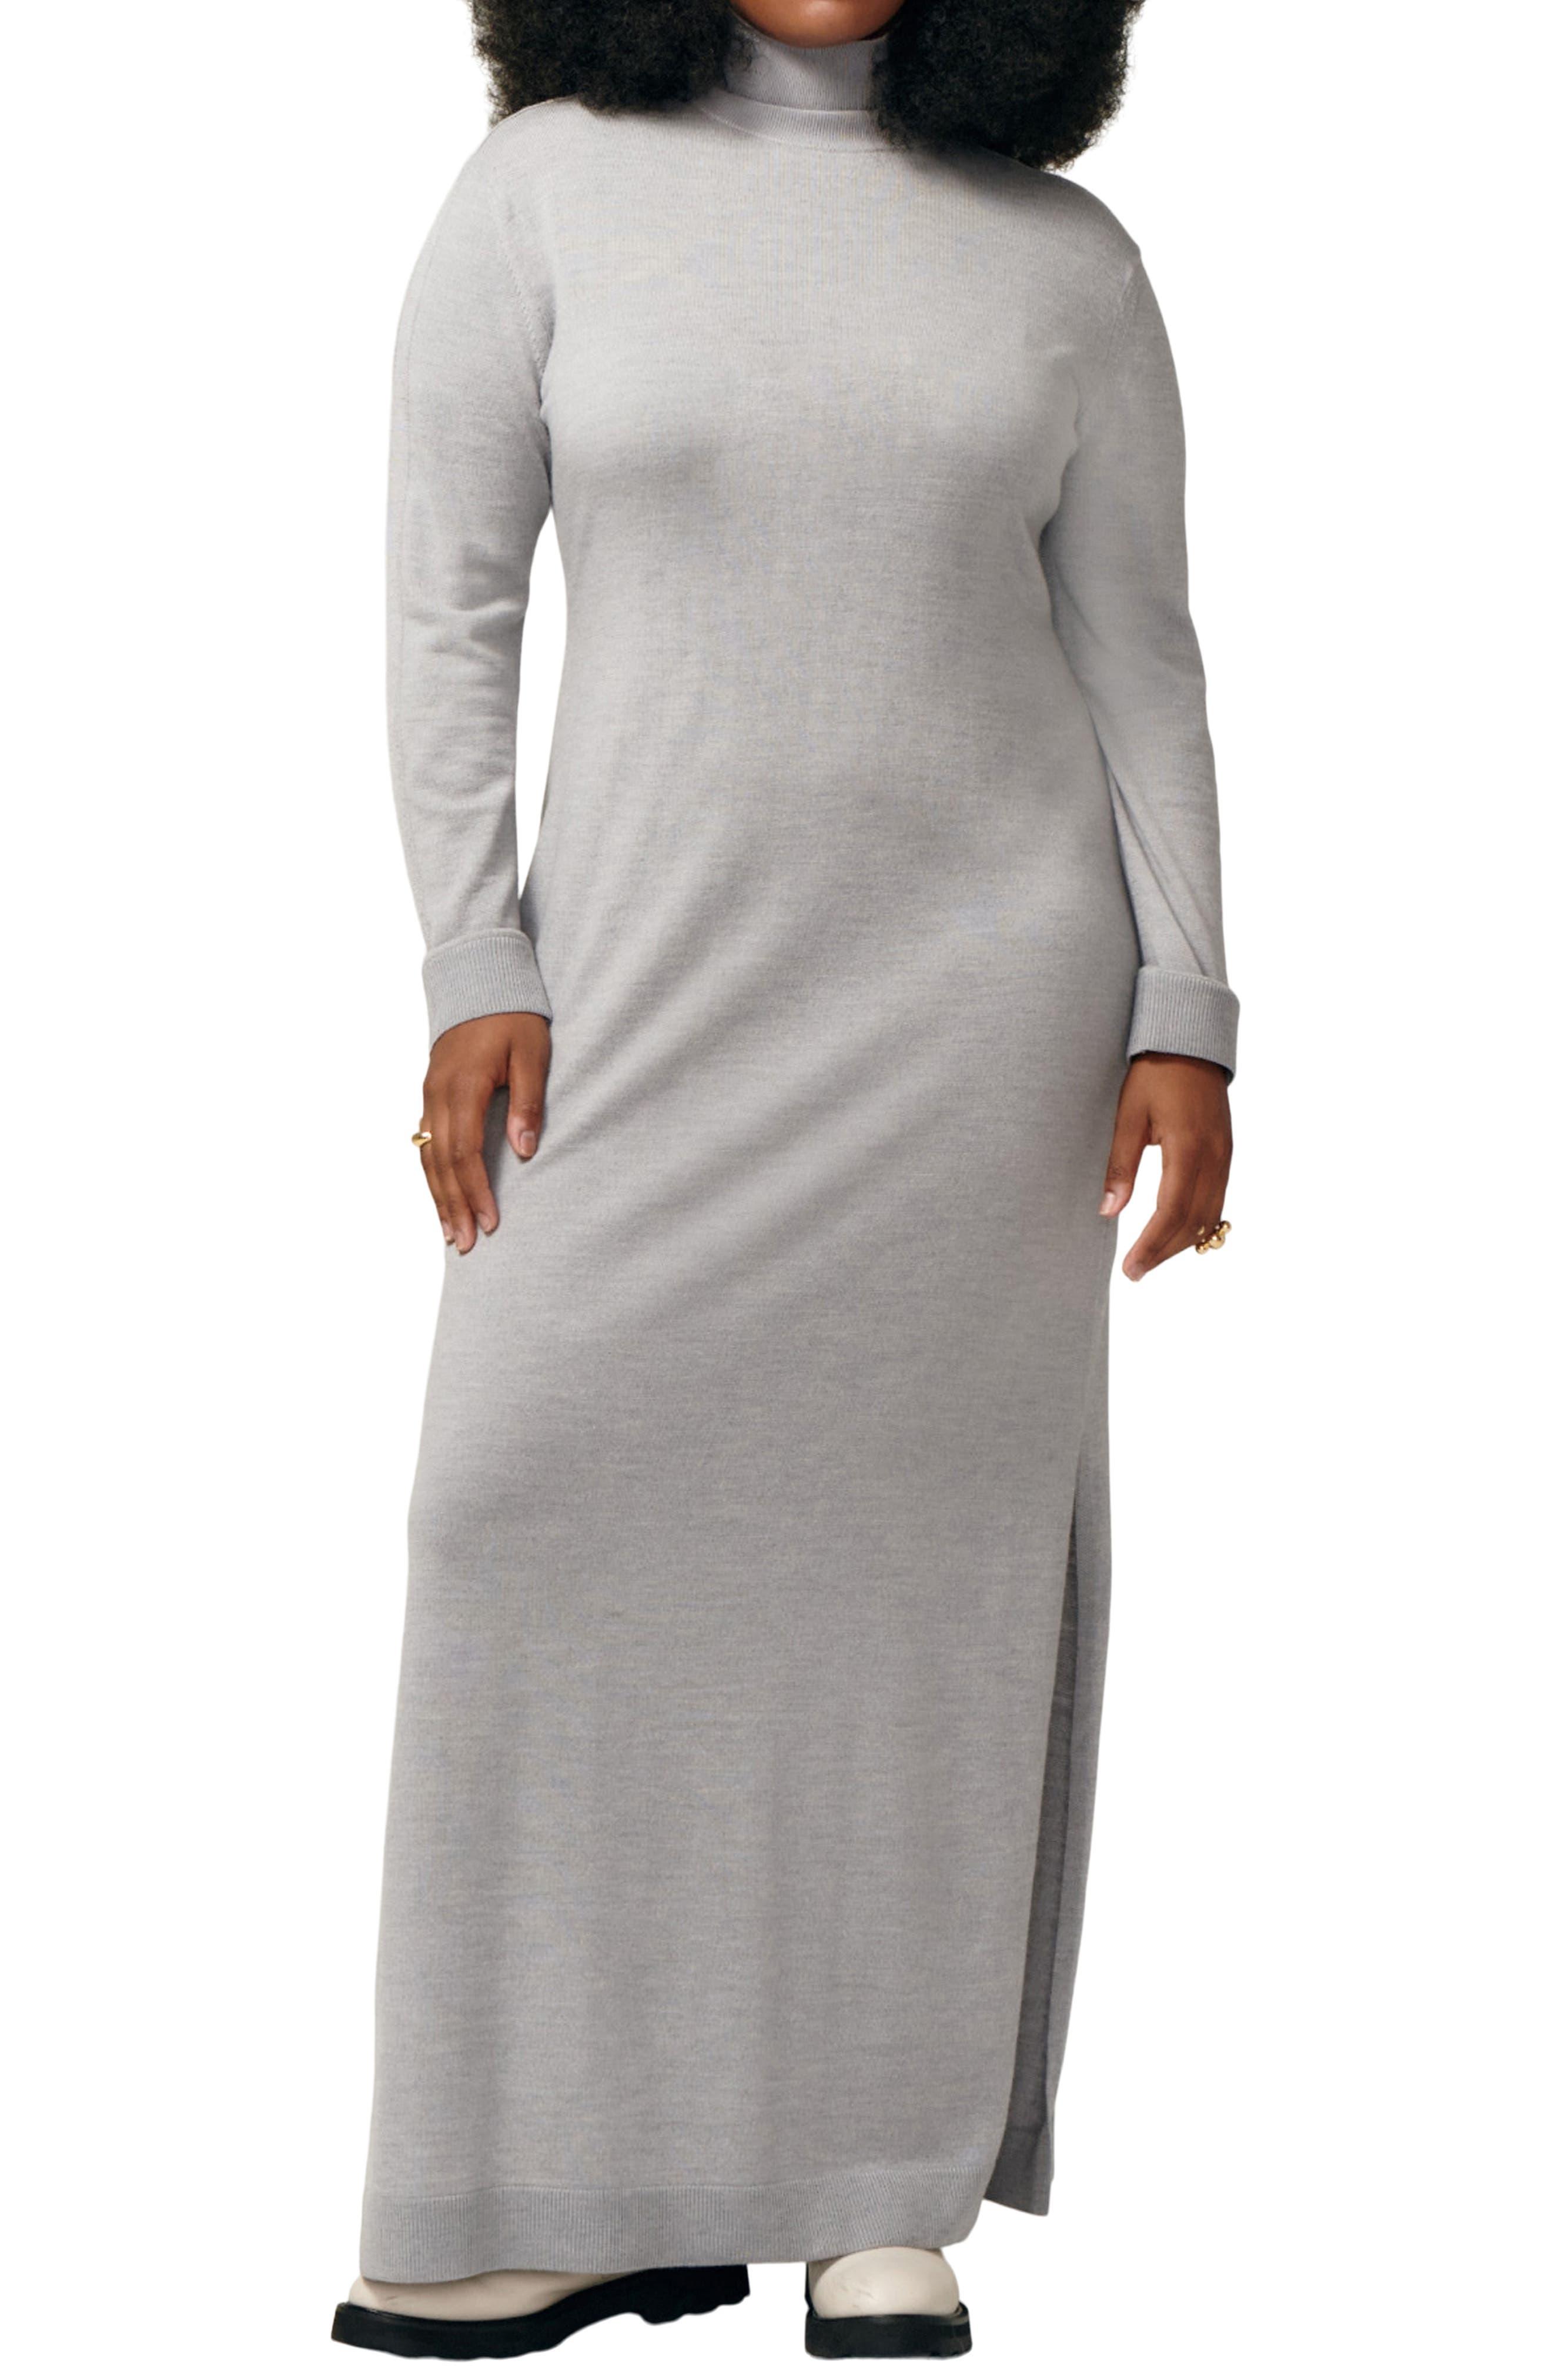 Affection Long Sleeve Merino Wool Jersey Sweater Dress